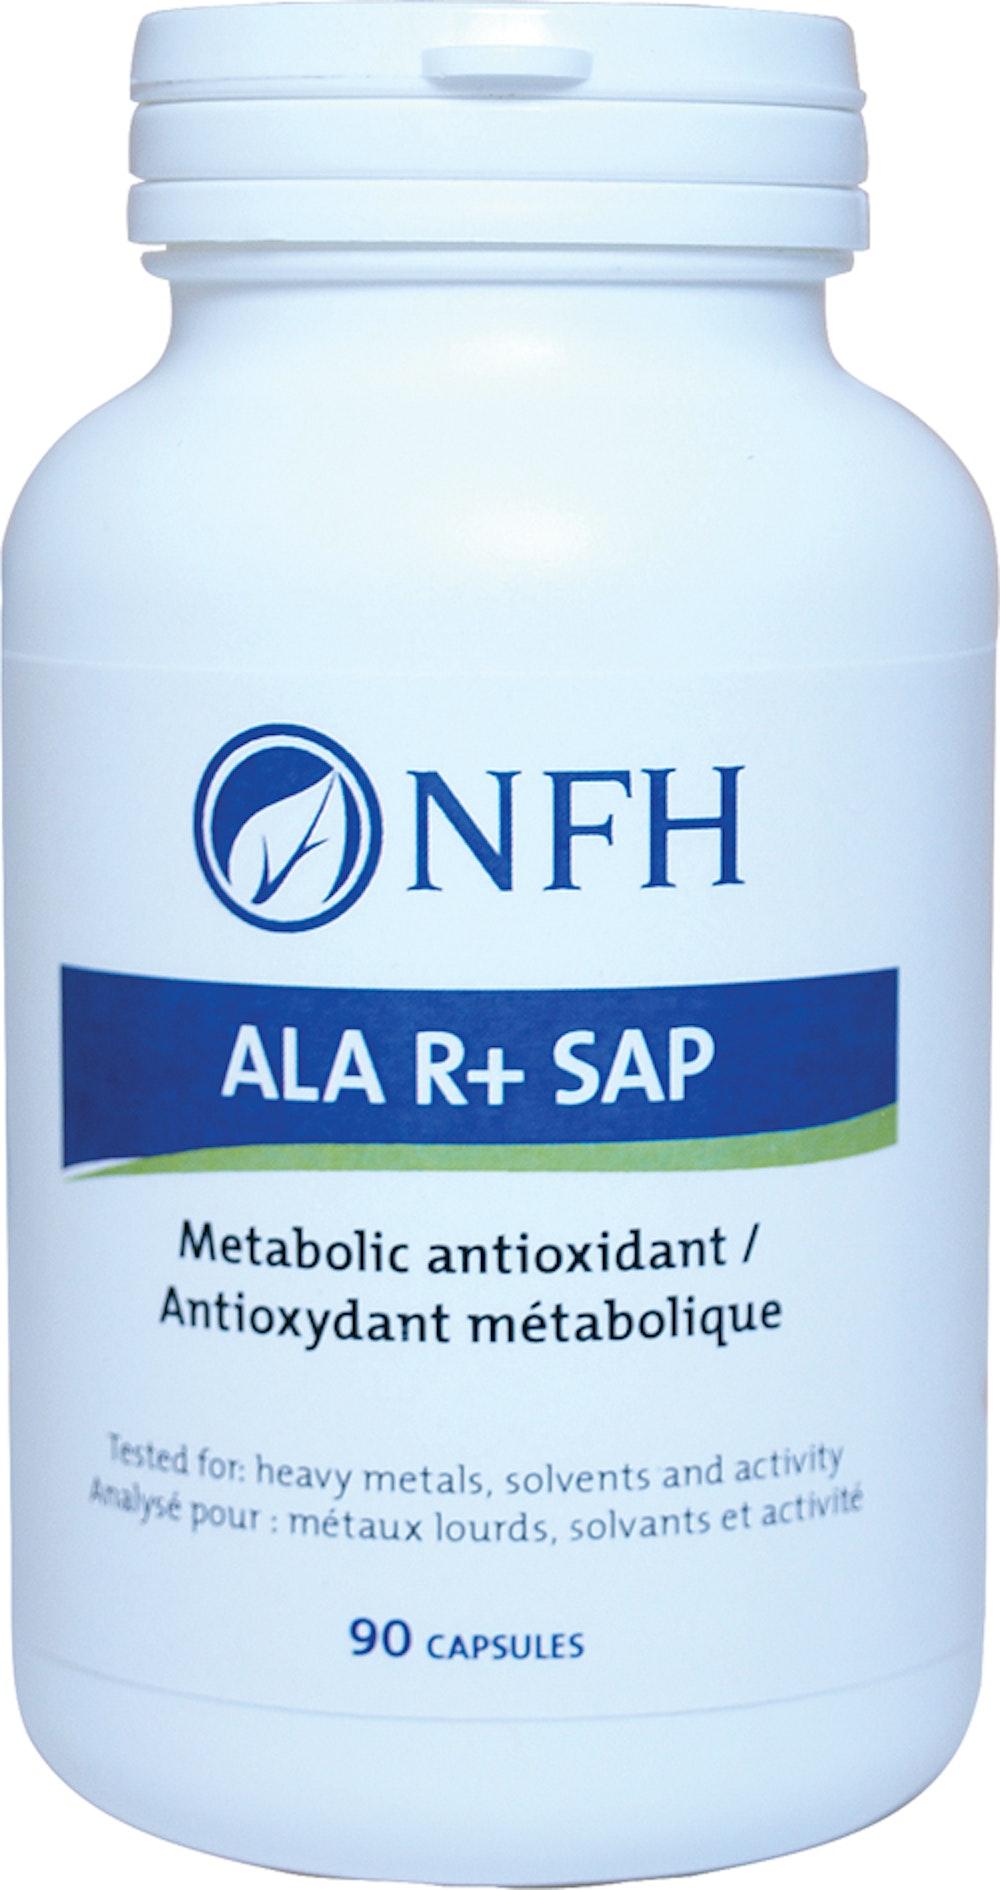 ALA R+ SAP (Antioxidant)